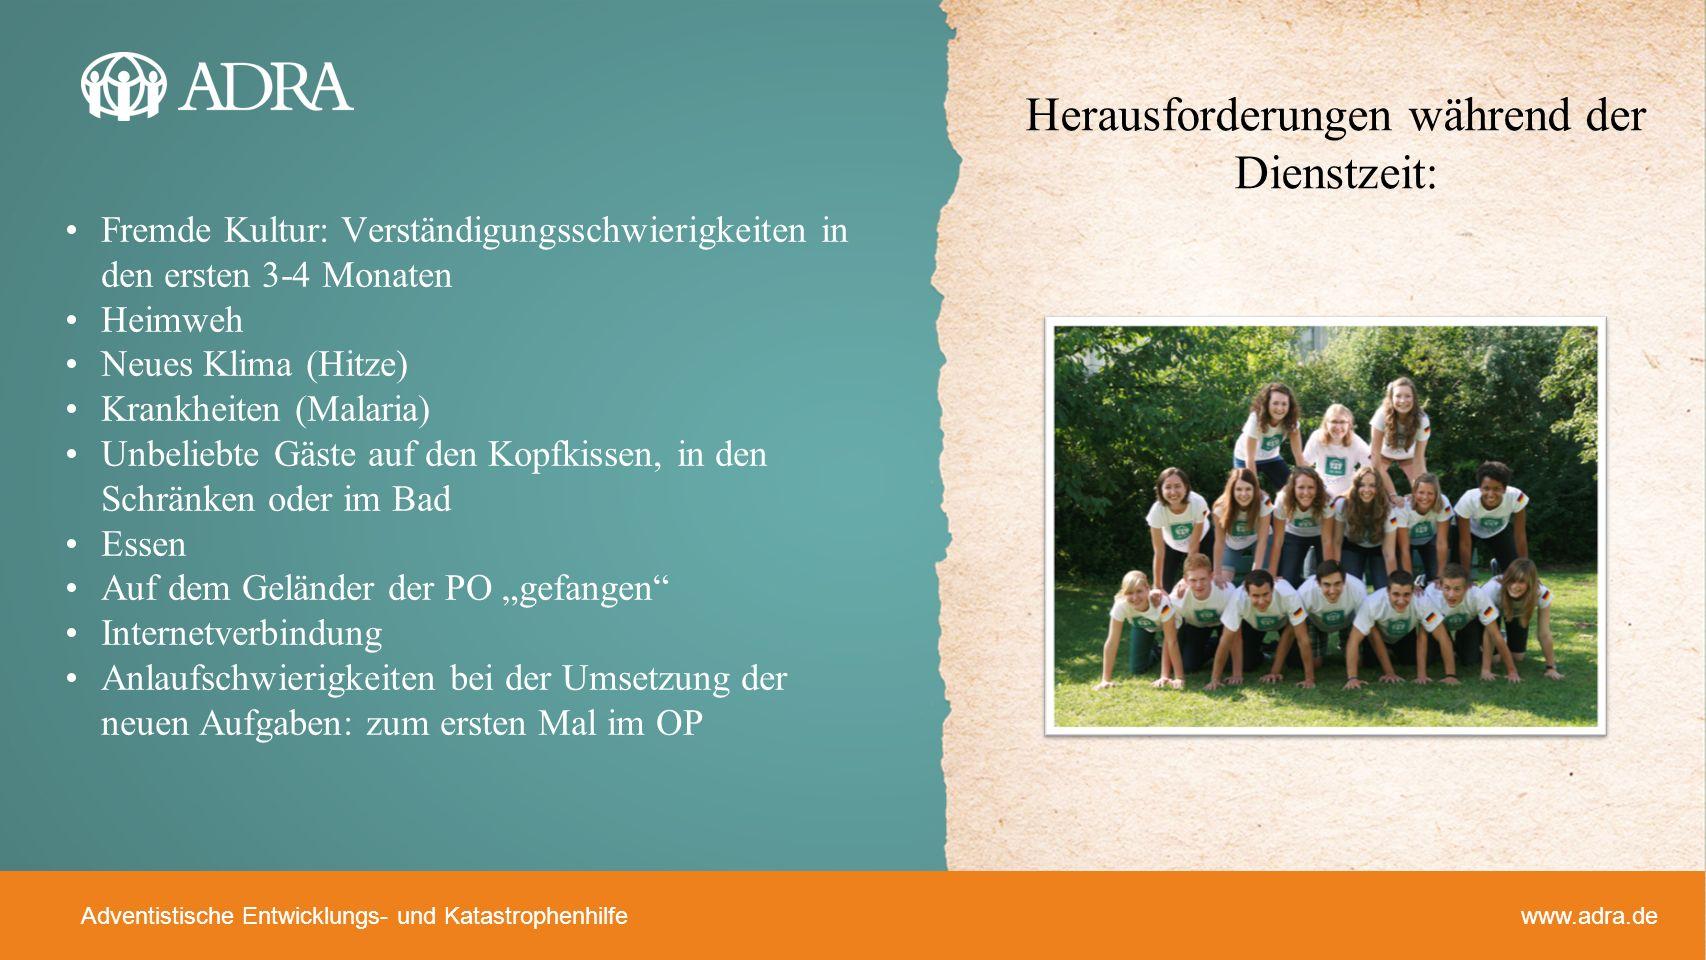 Adventistische Entwicklungs- und Katastrophenhilfe www.adra.de Kontaktdaten: Sabine.Beyer@adra.de 06151-811533 Bianca.Greising@adra.de 06151-811538 http://live.adra.de/ausland/ http://www.weltwaerts.de/